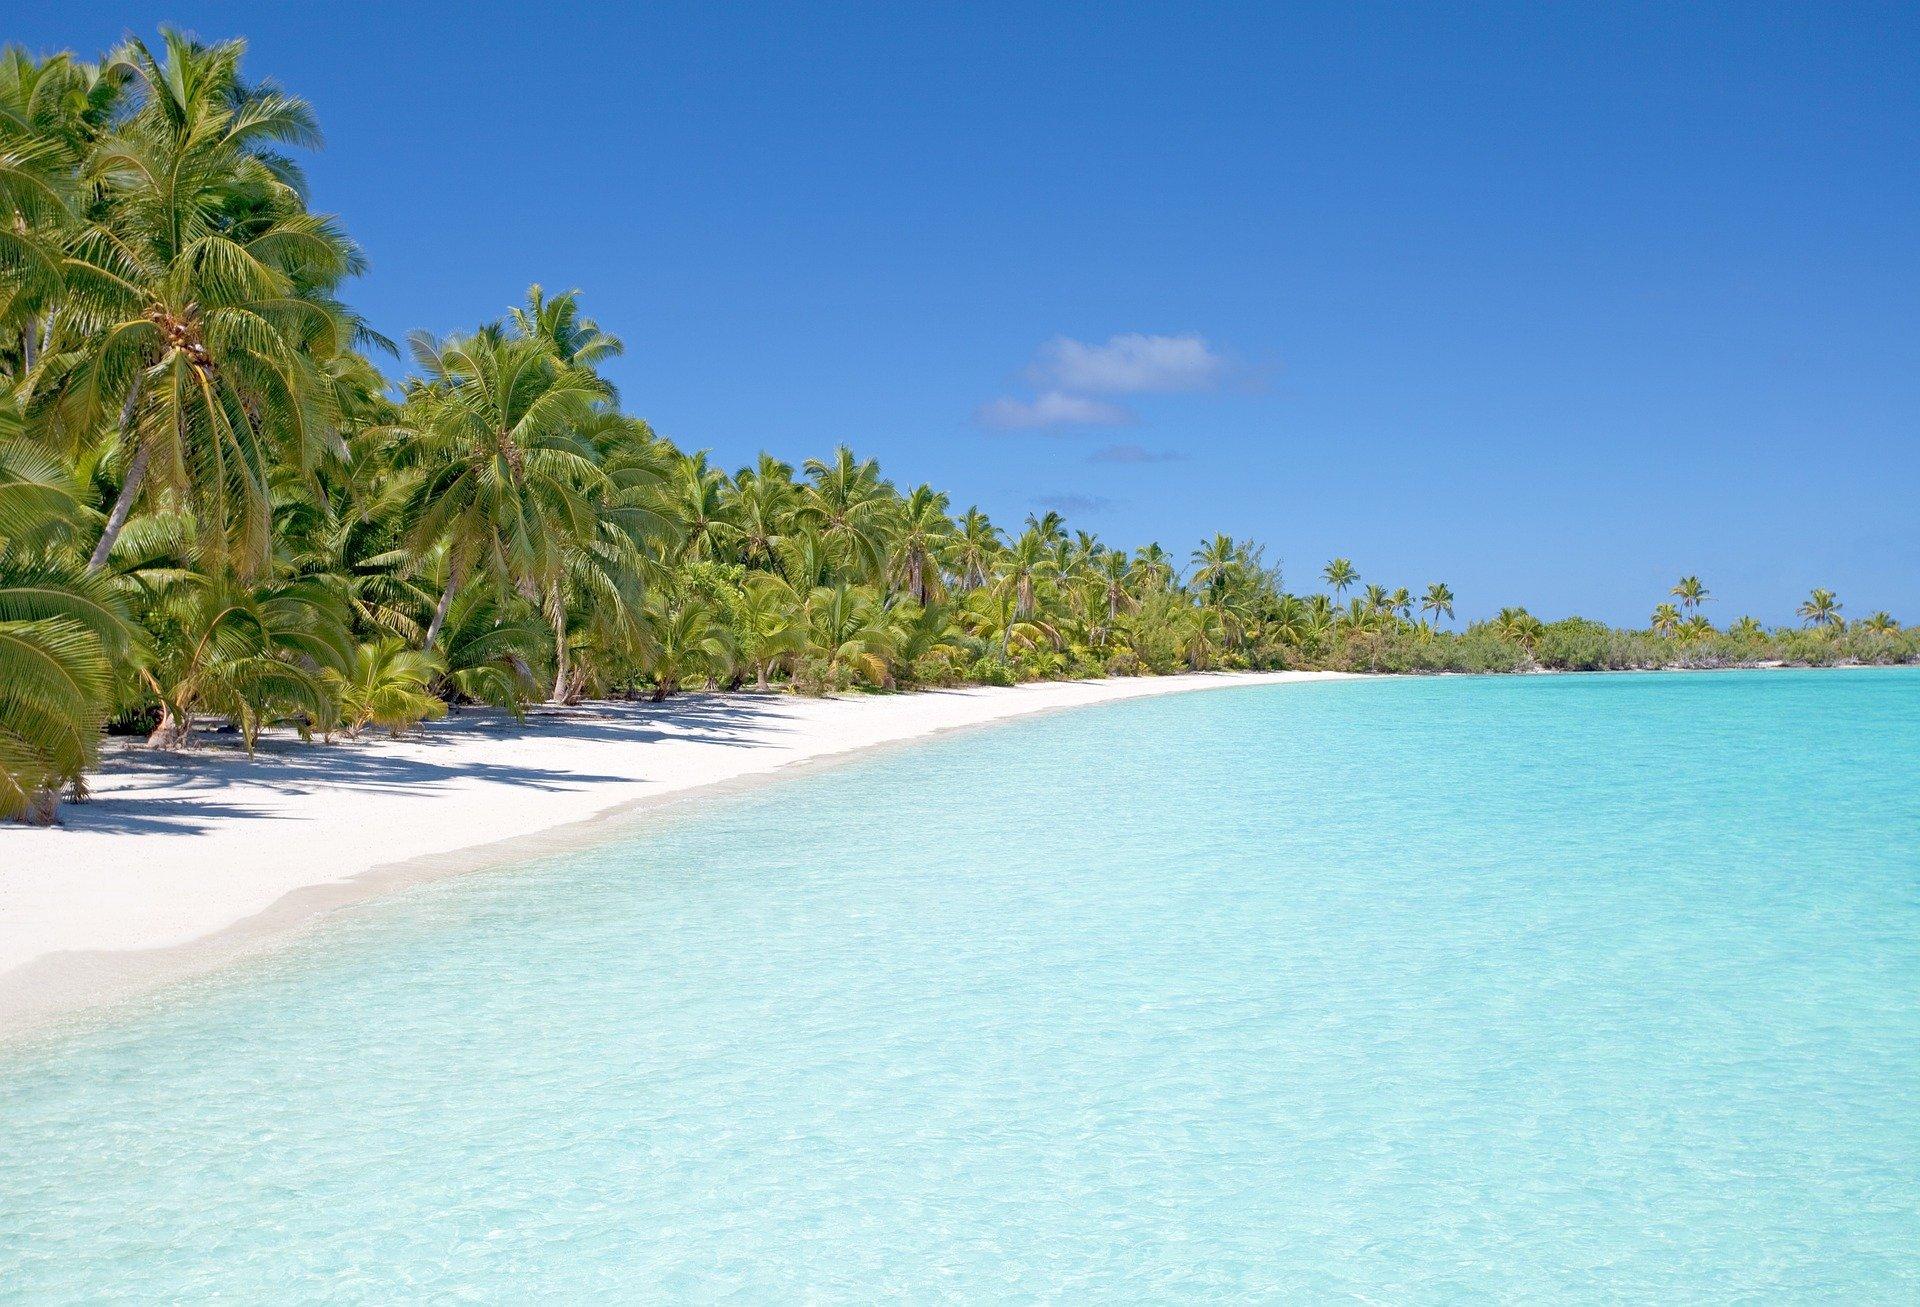 A palm tree beach